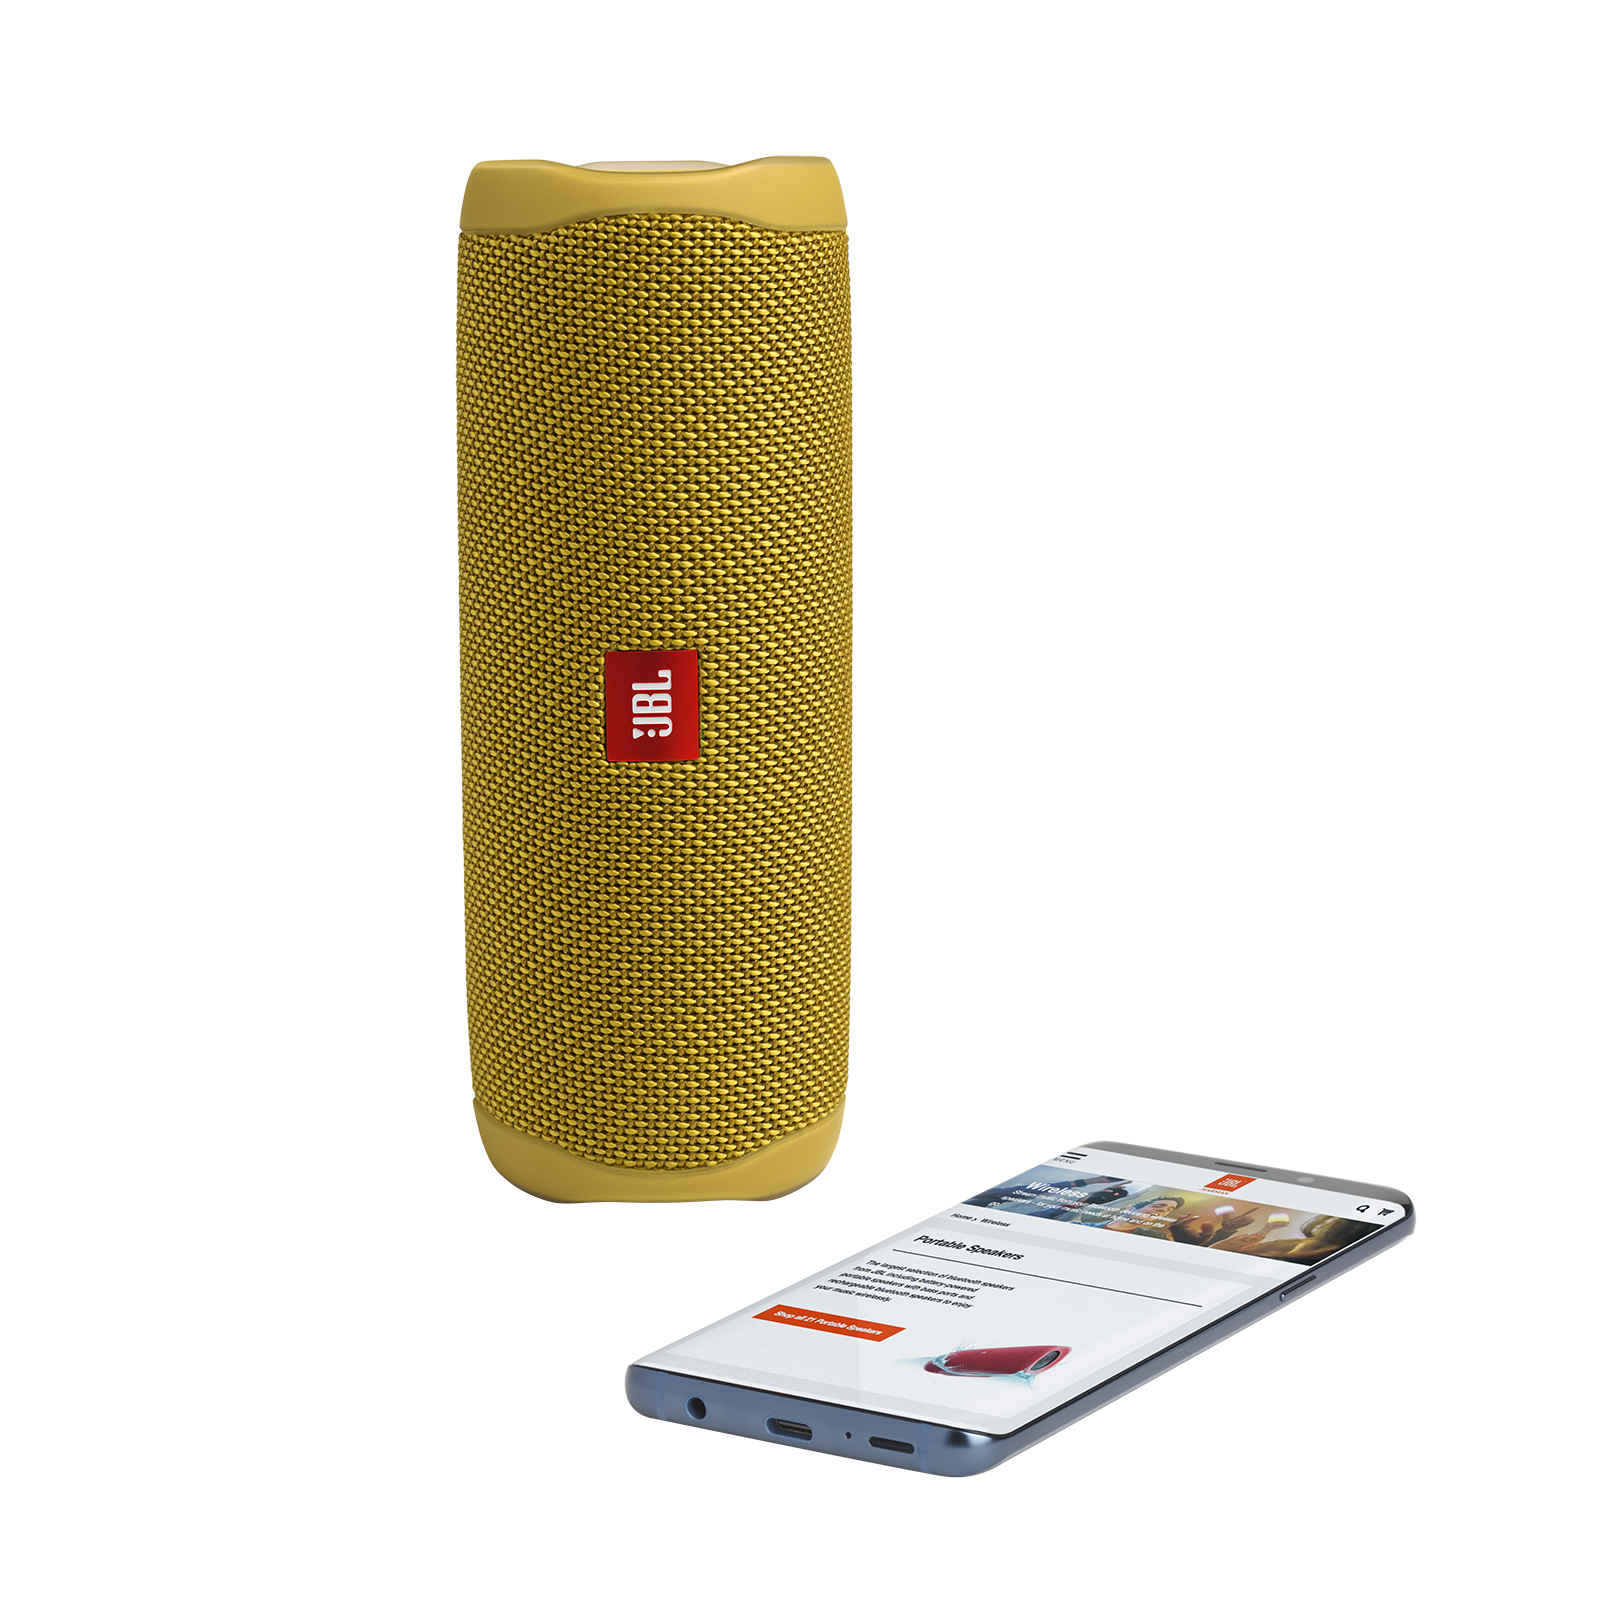 JBL-Flip-5-Portable-Waterproof-Bluetooth-PartyBoost-Speaker-Black-amp-Colours miniatura 51